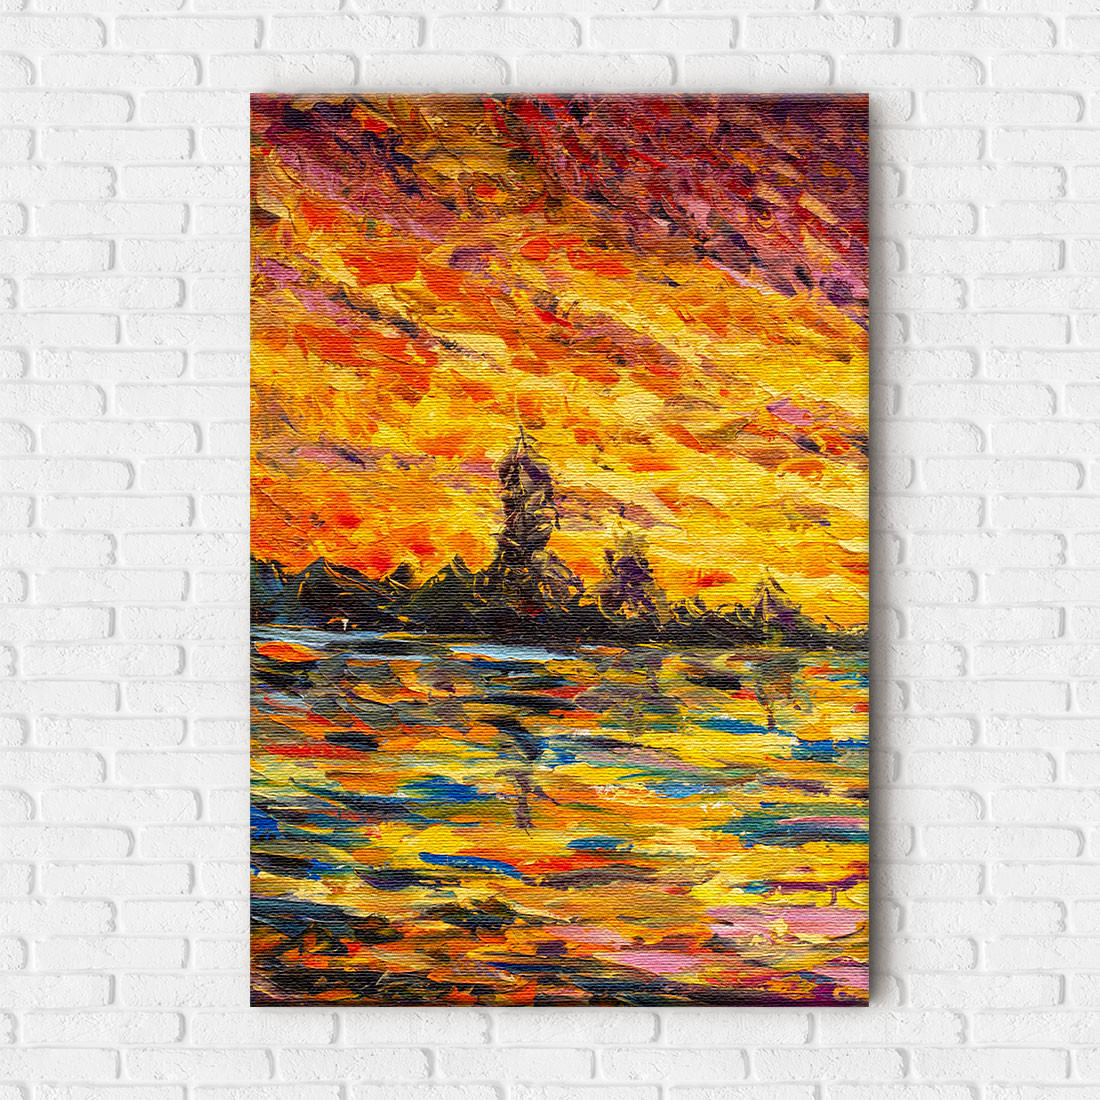 Quadro Decorativo Pintura Abstrata Outono